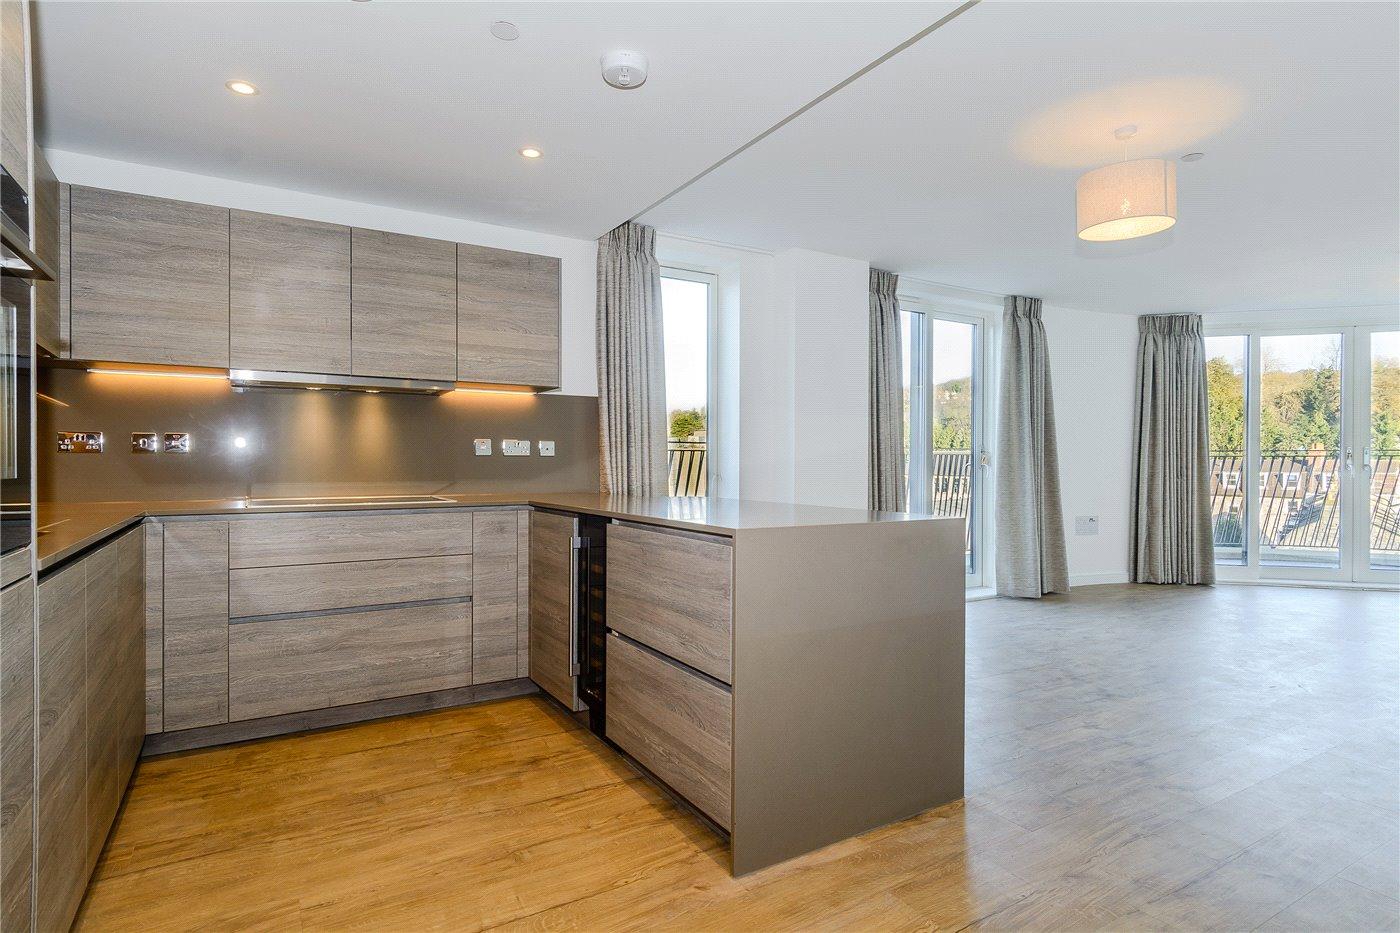 2 Bedroom Bat For Rent | 2 Bedroom Property To Rent In Royal View Victoria Bridge Road Bath